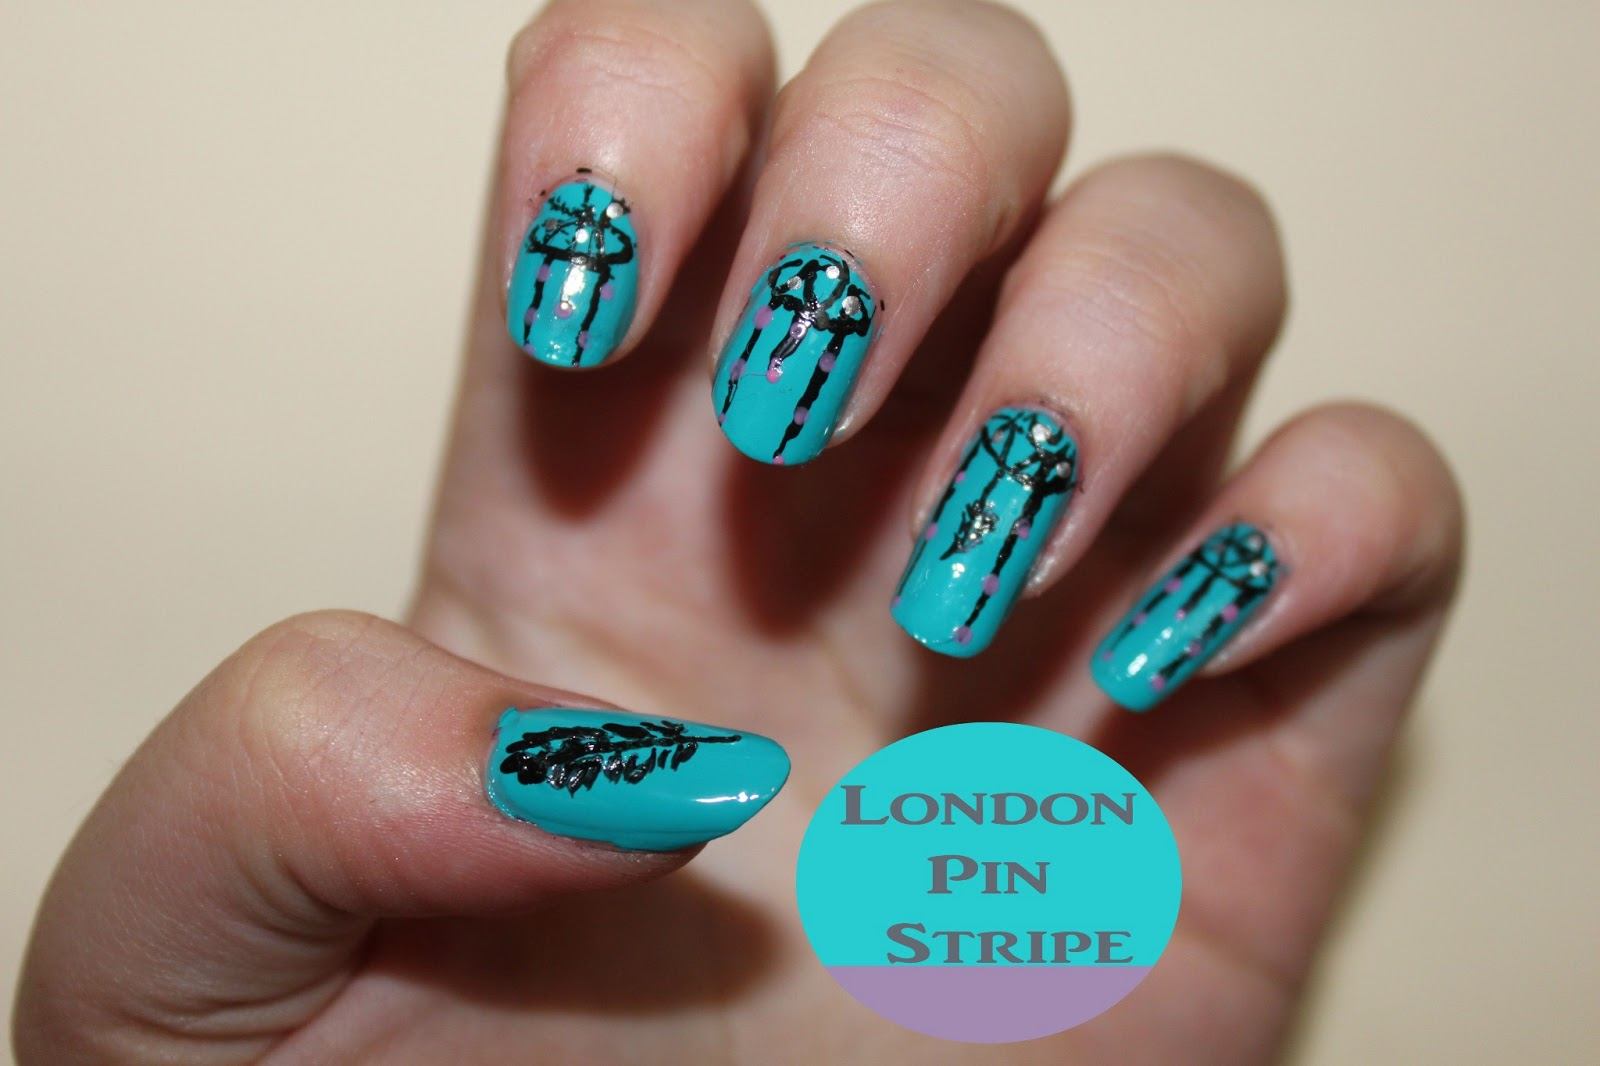 Dream catcher nails   London Pin Stripe